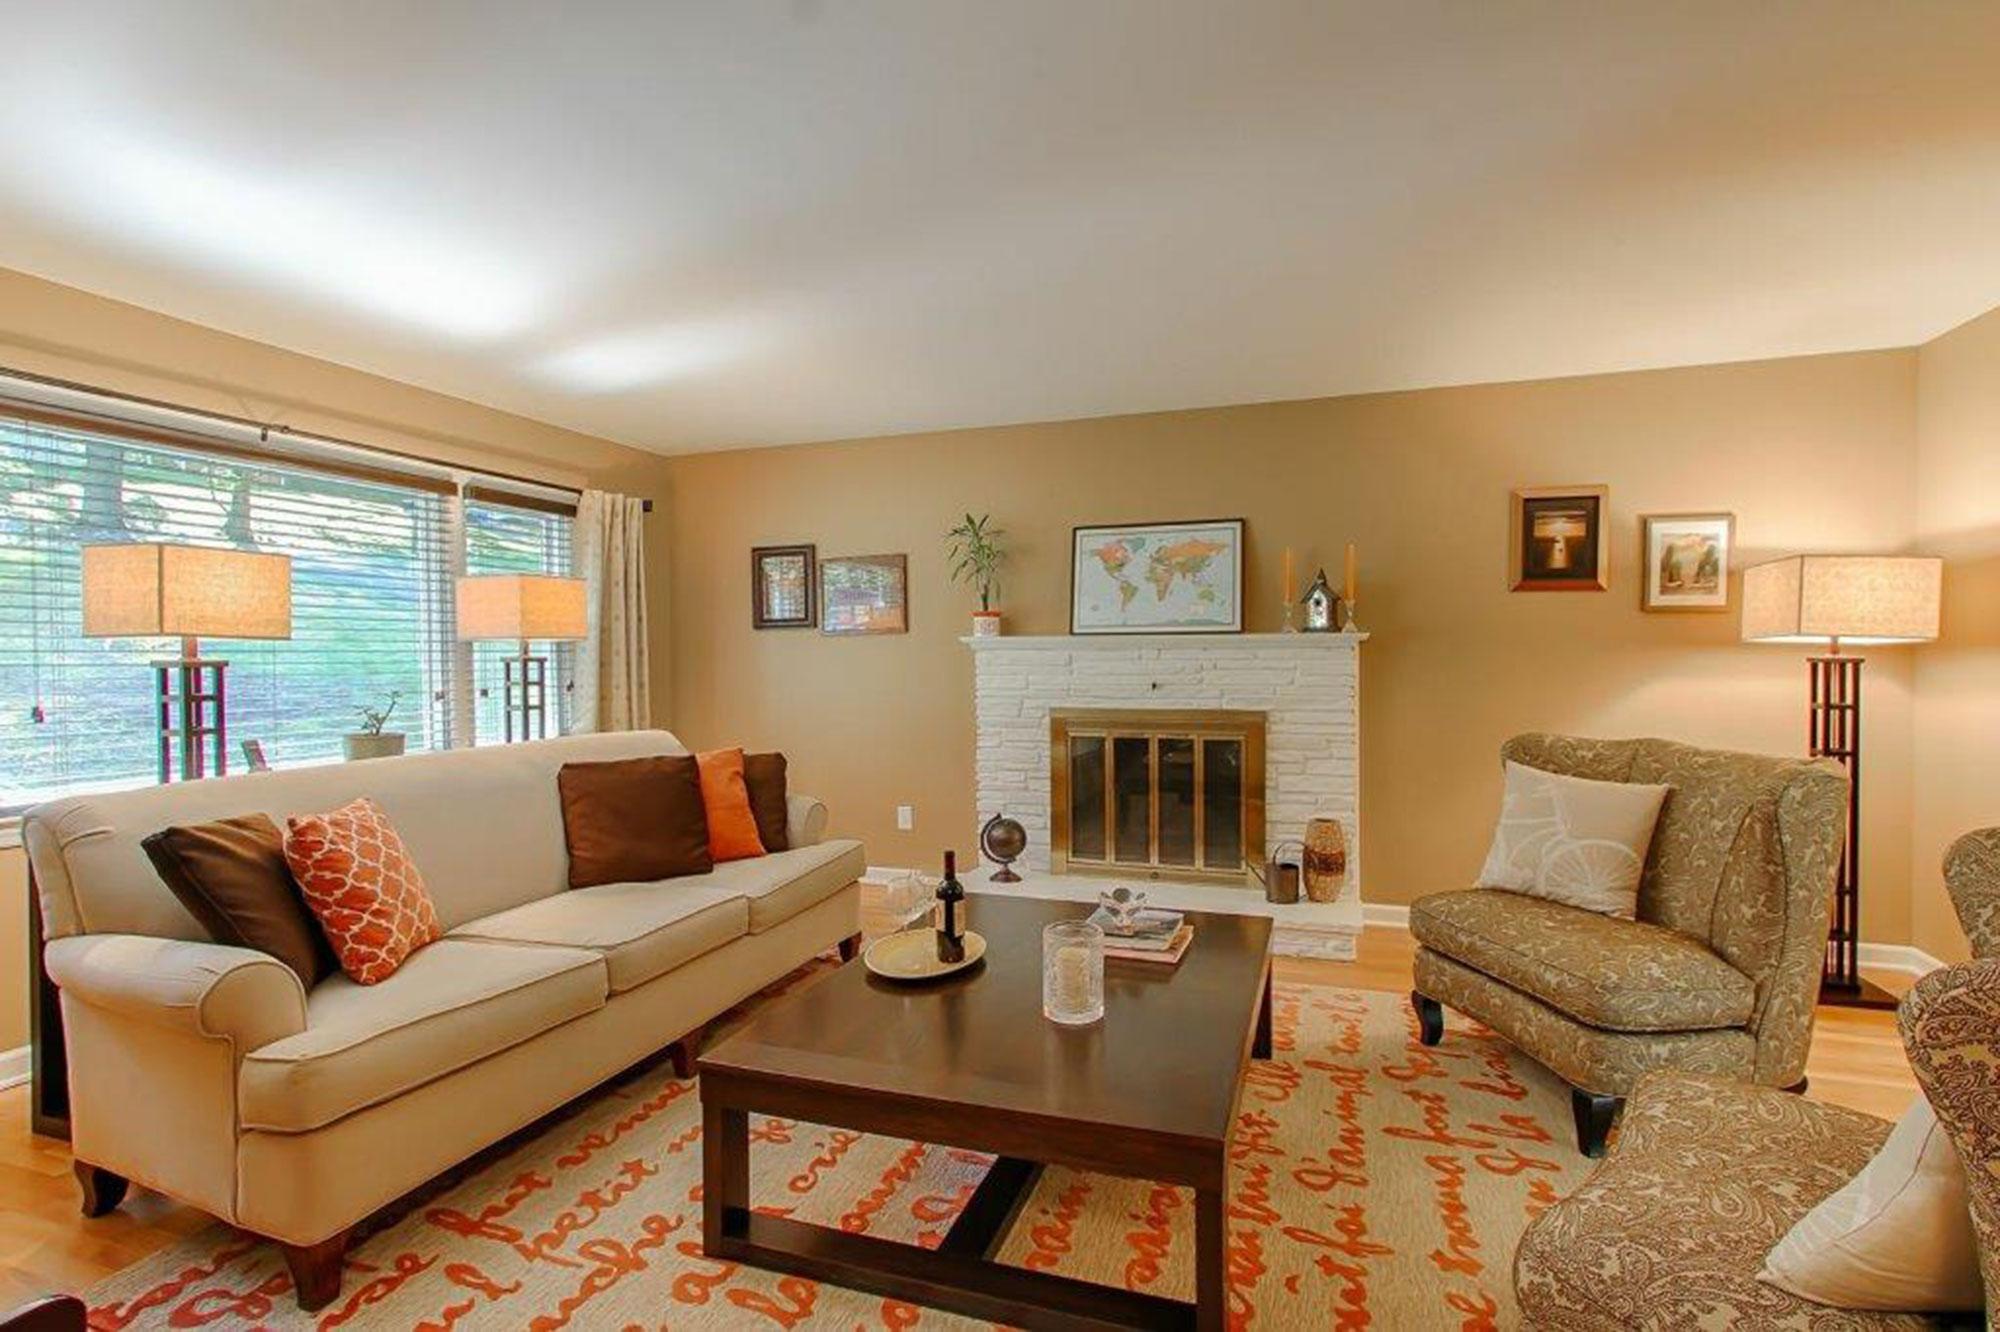 homes for sale in Randolph, NJ